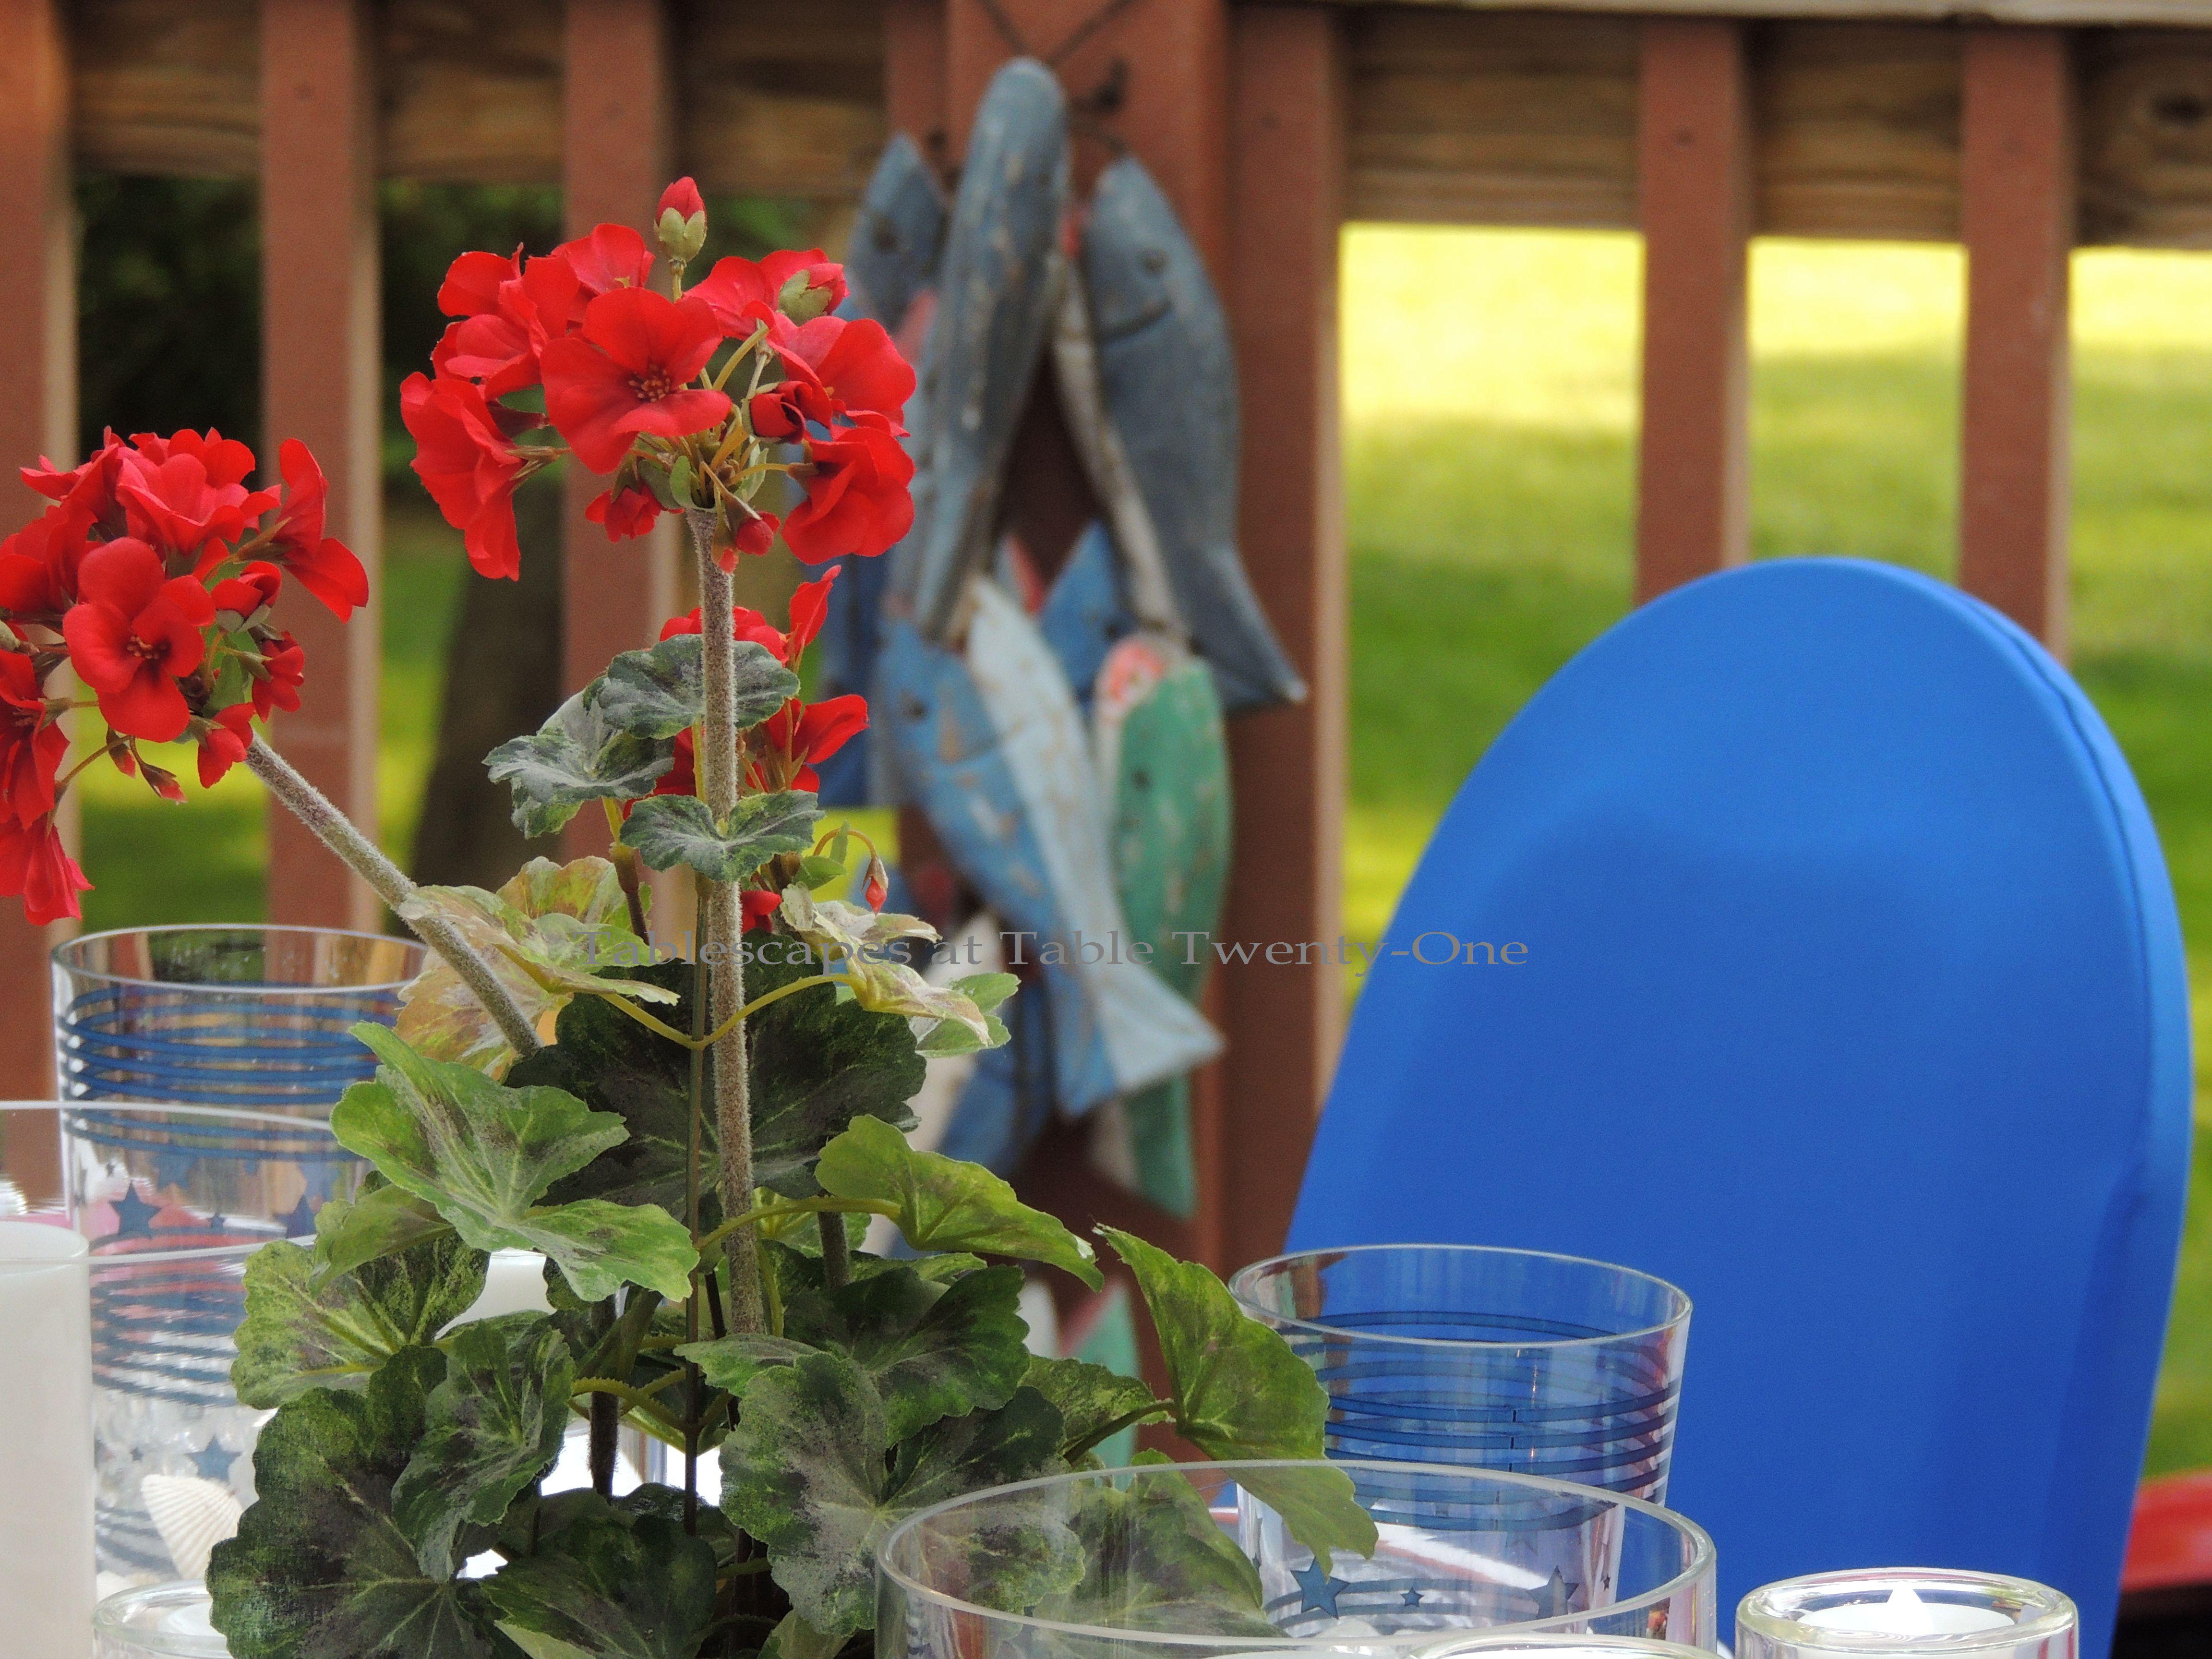 Tablescapes at Table Twenty-One, www.tabletwentyone.wordpress.com, 4th of July Coastal Style: red geranium